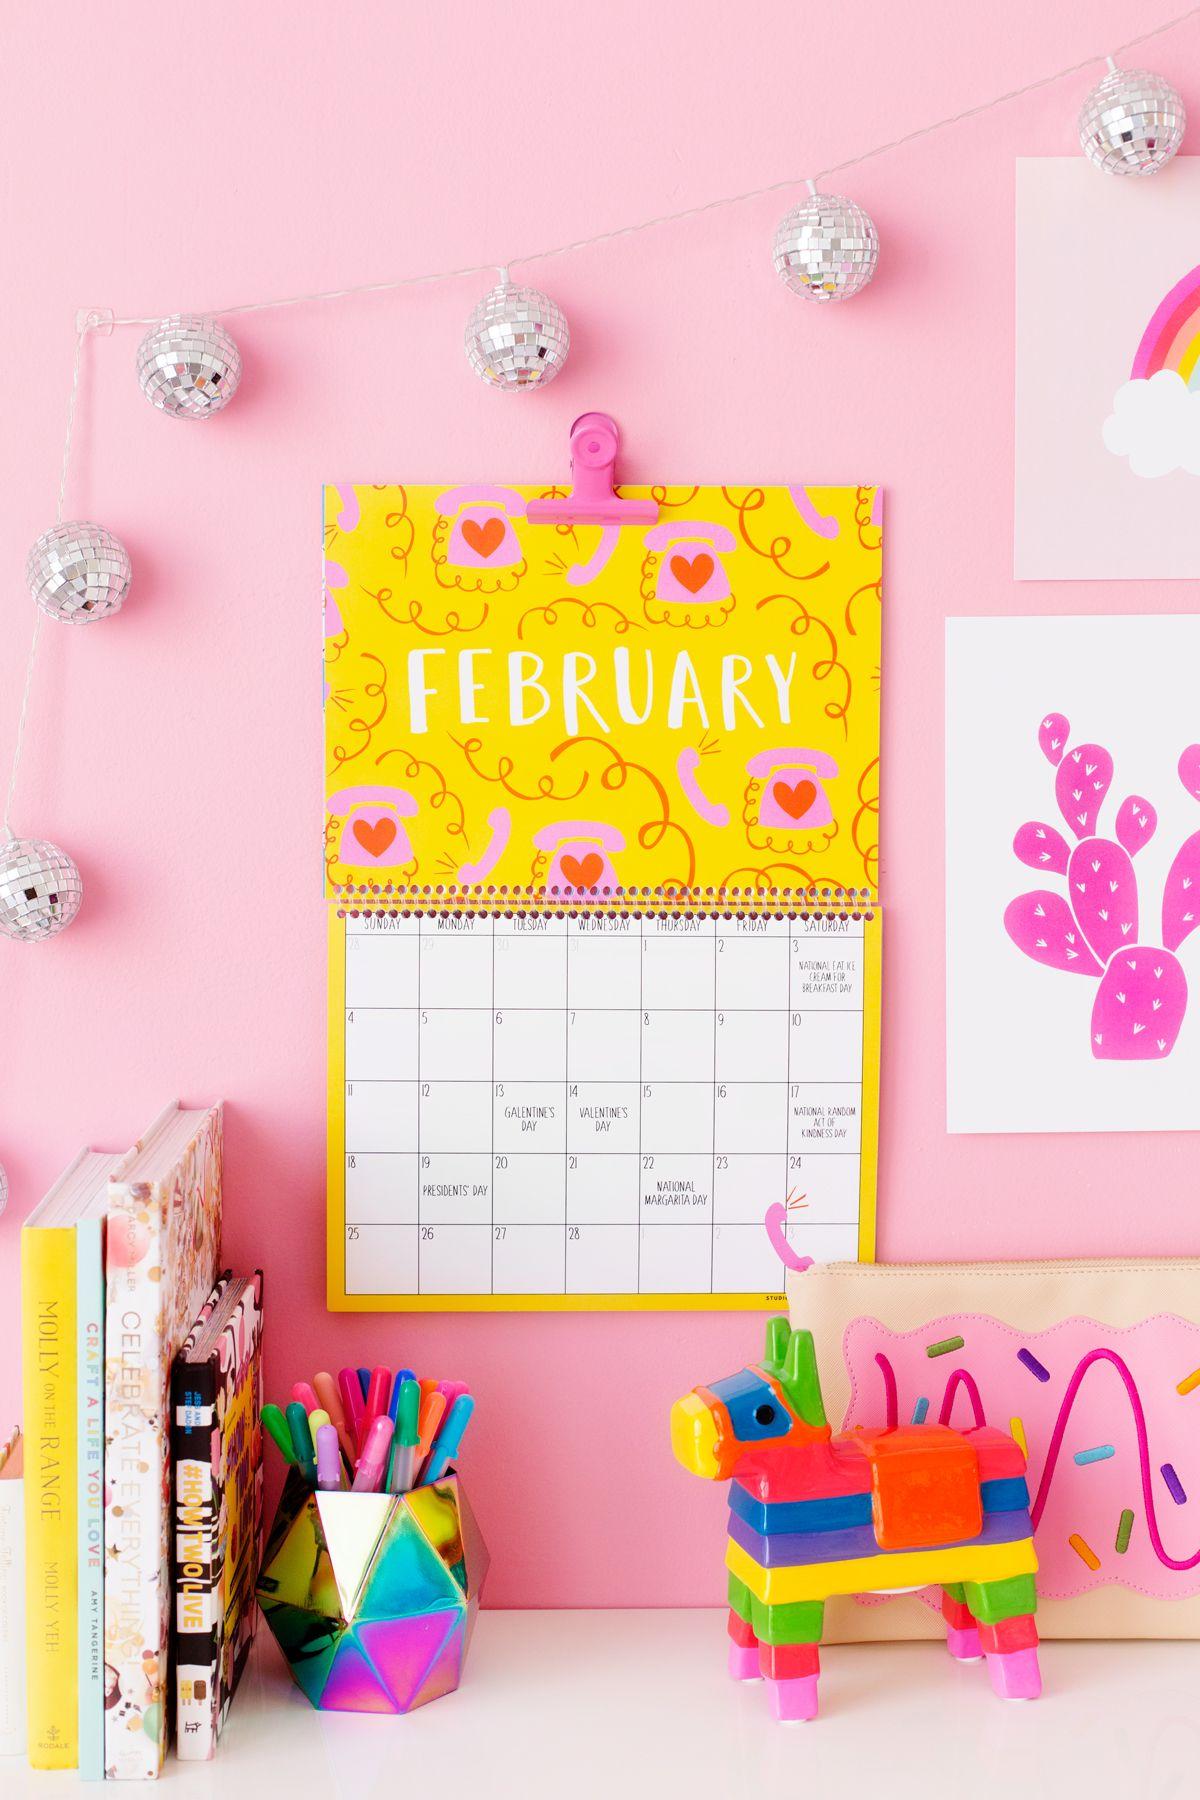 2018 Free Printable Wall Calendar | Printables | Pinterest | Free ...